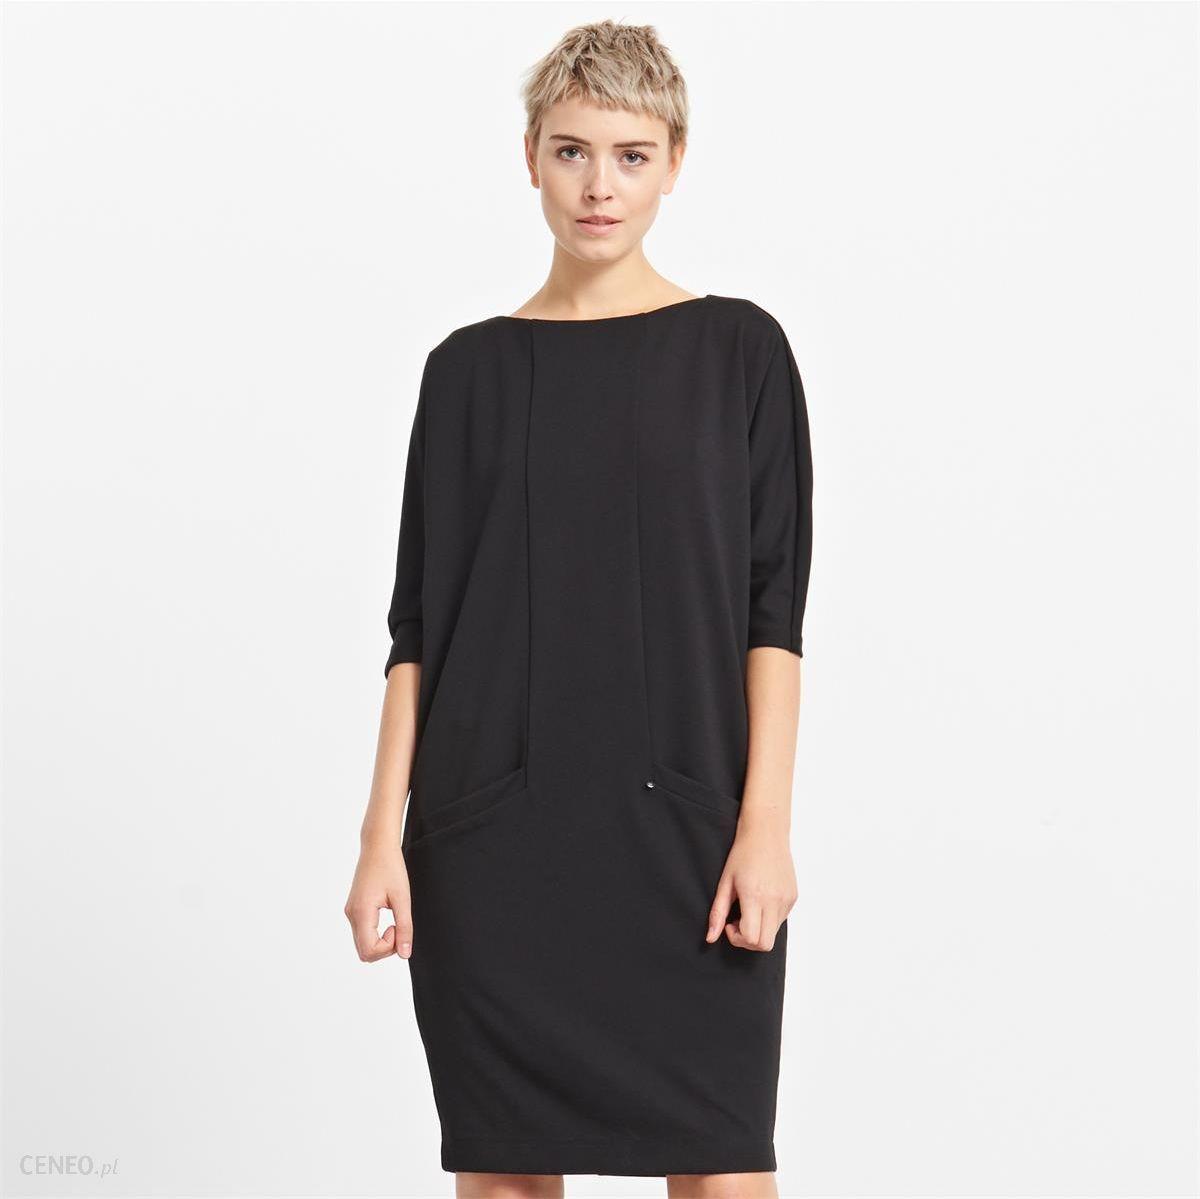 e3a2126e4a Reserved - Sukienka oversize z kieszeniami - Czarny - damska - zdjęcie 1